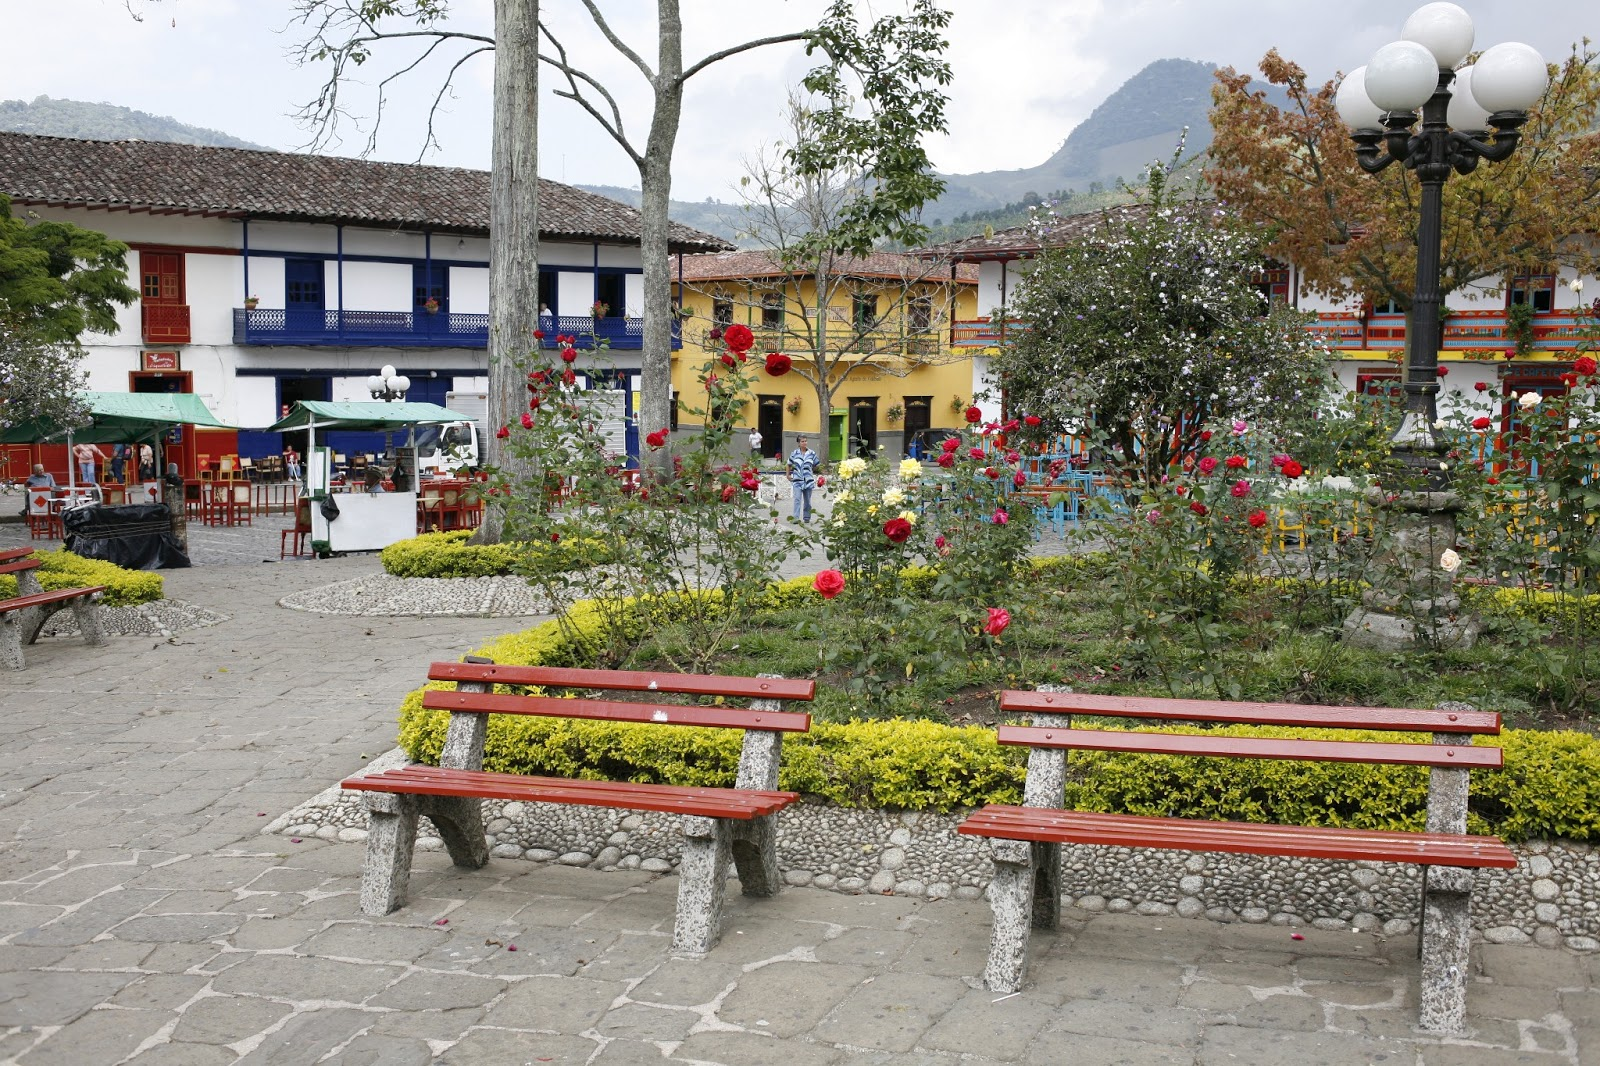 Laura blight photography jardin colombia for Jardin kolumbien